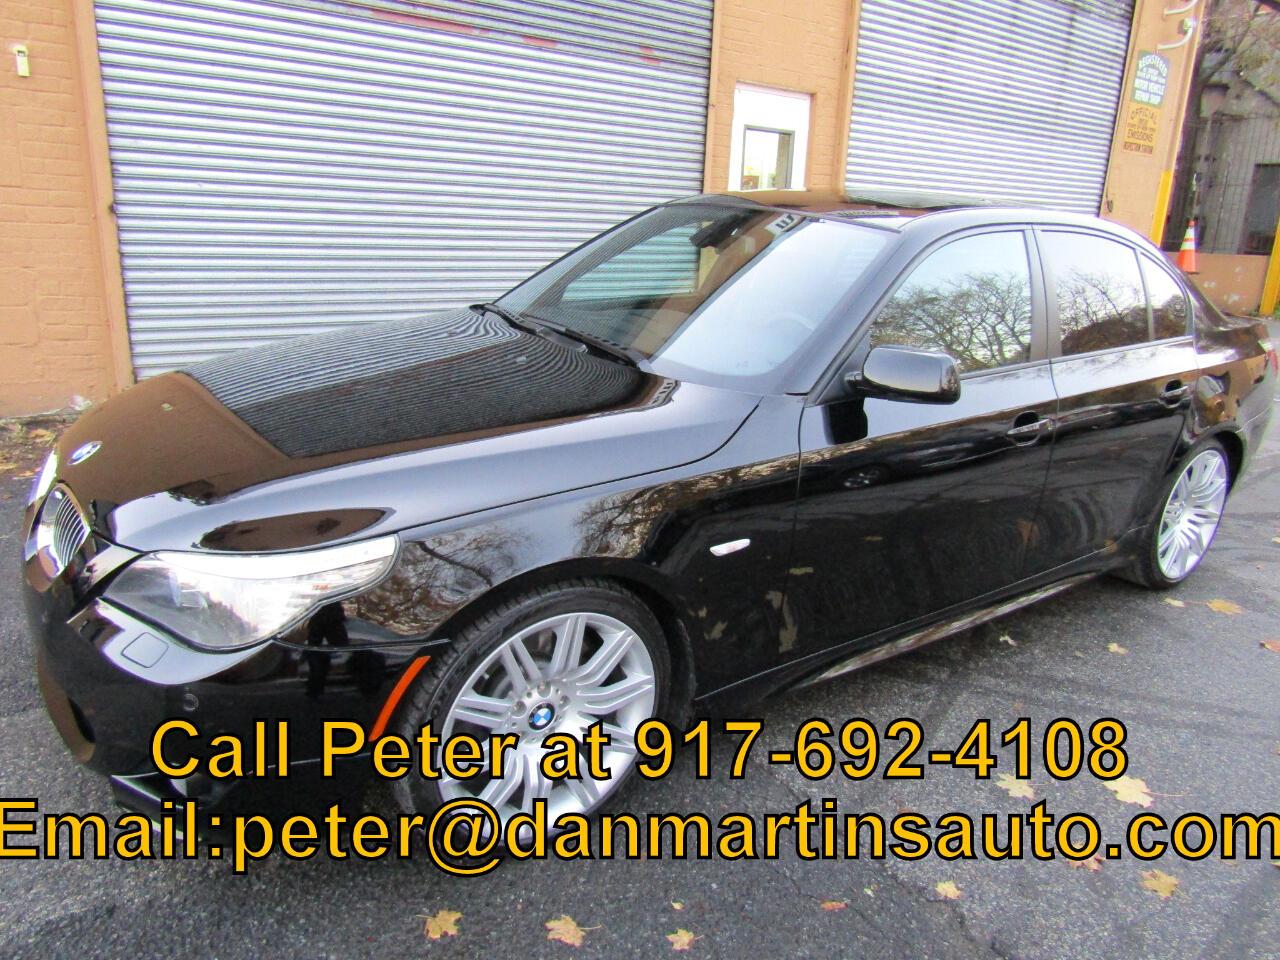 BMW 5 Series 4dr Sdn 550i RWD 2010